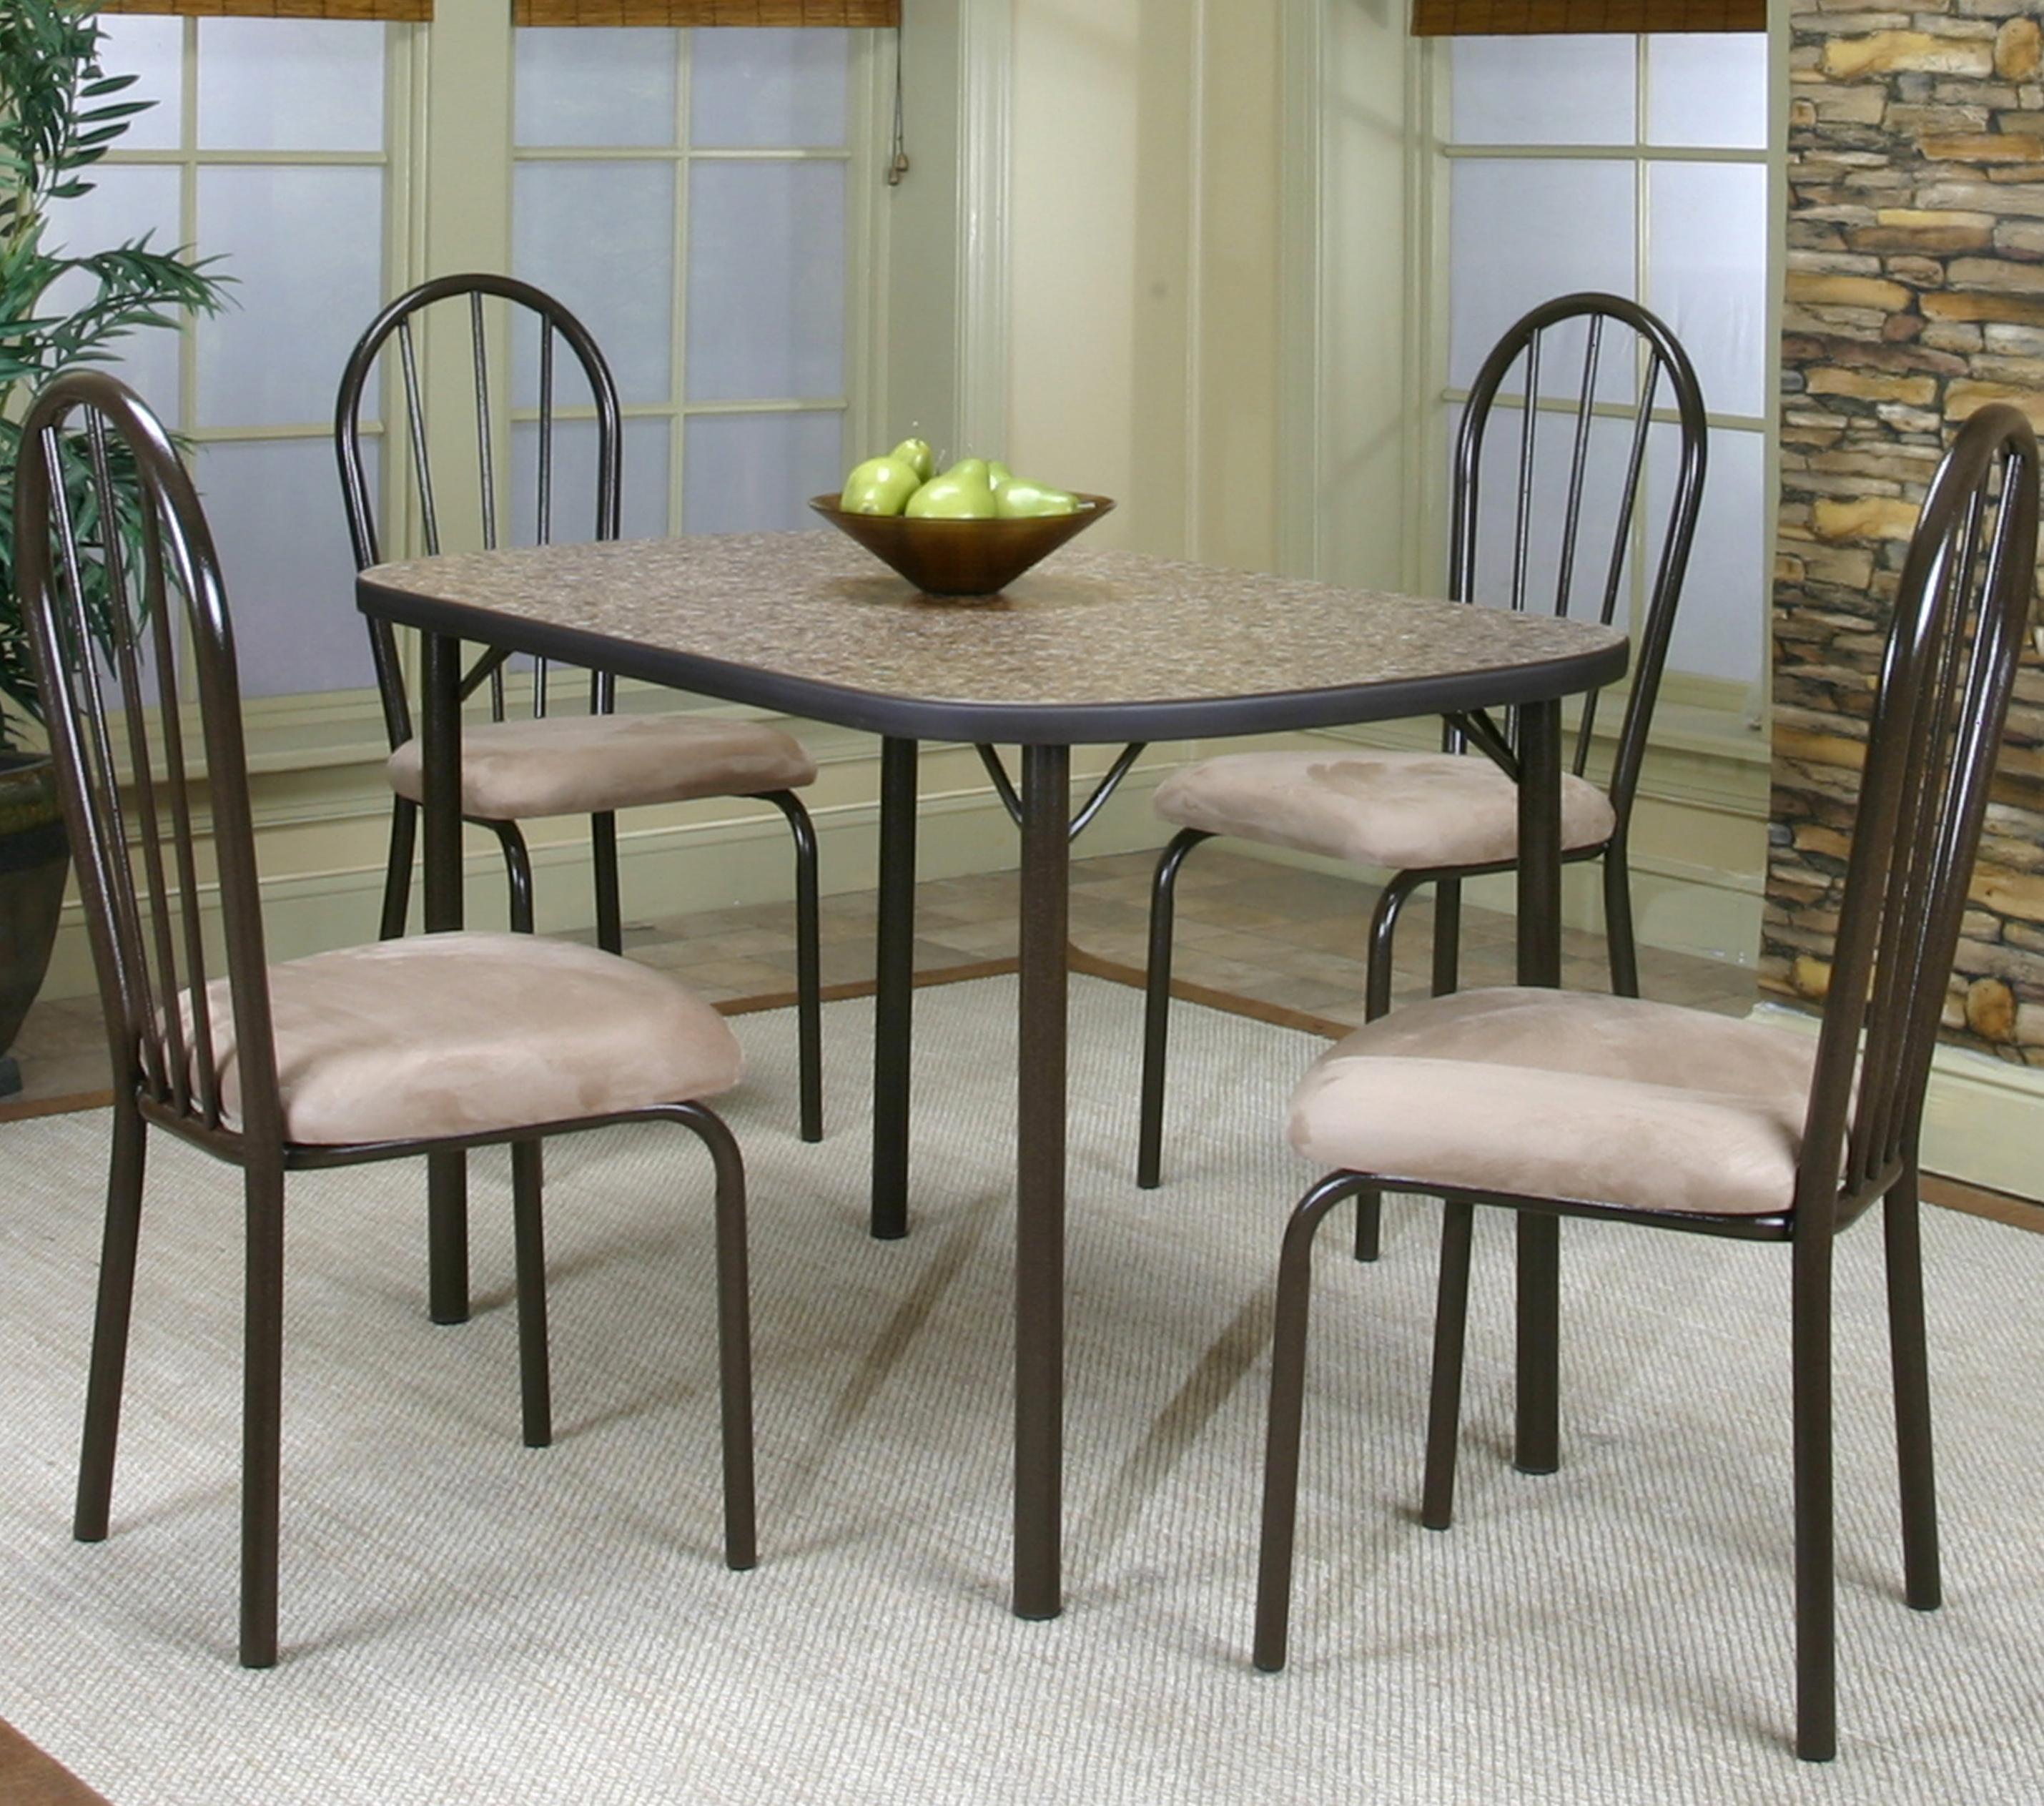 Cramco, Inc Cramco Dinettes - Heath Woodstock Granite Laminate Top Table - Item Number: D7227-58+4x01